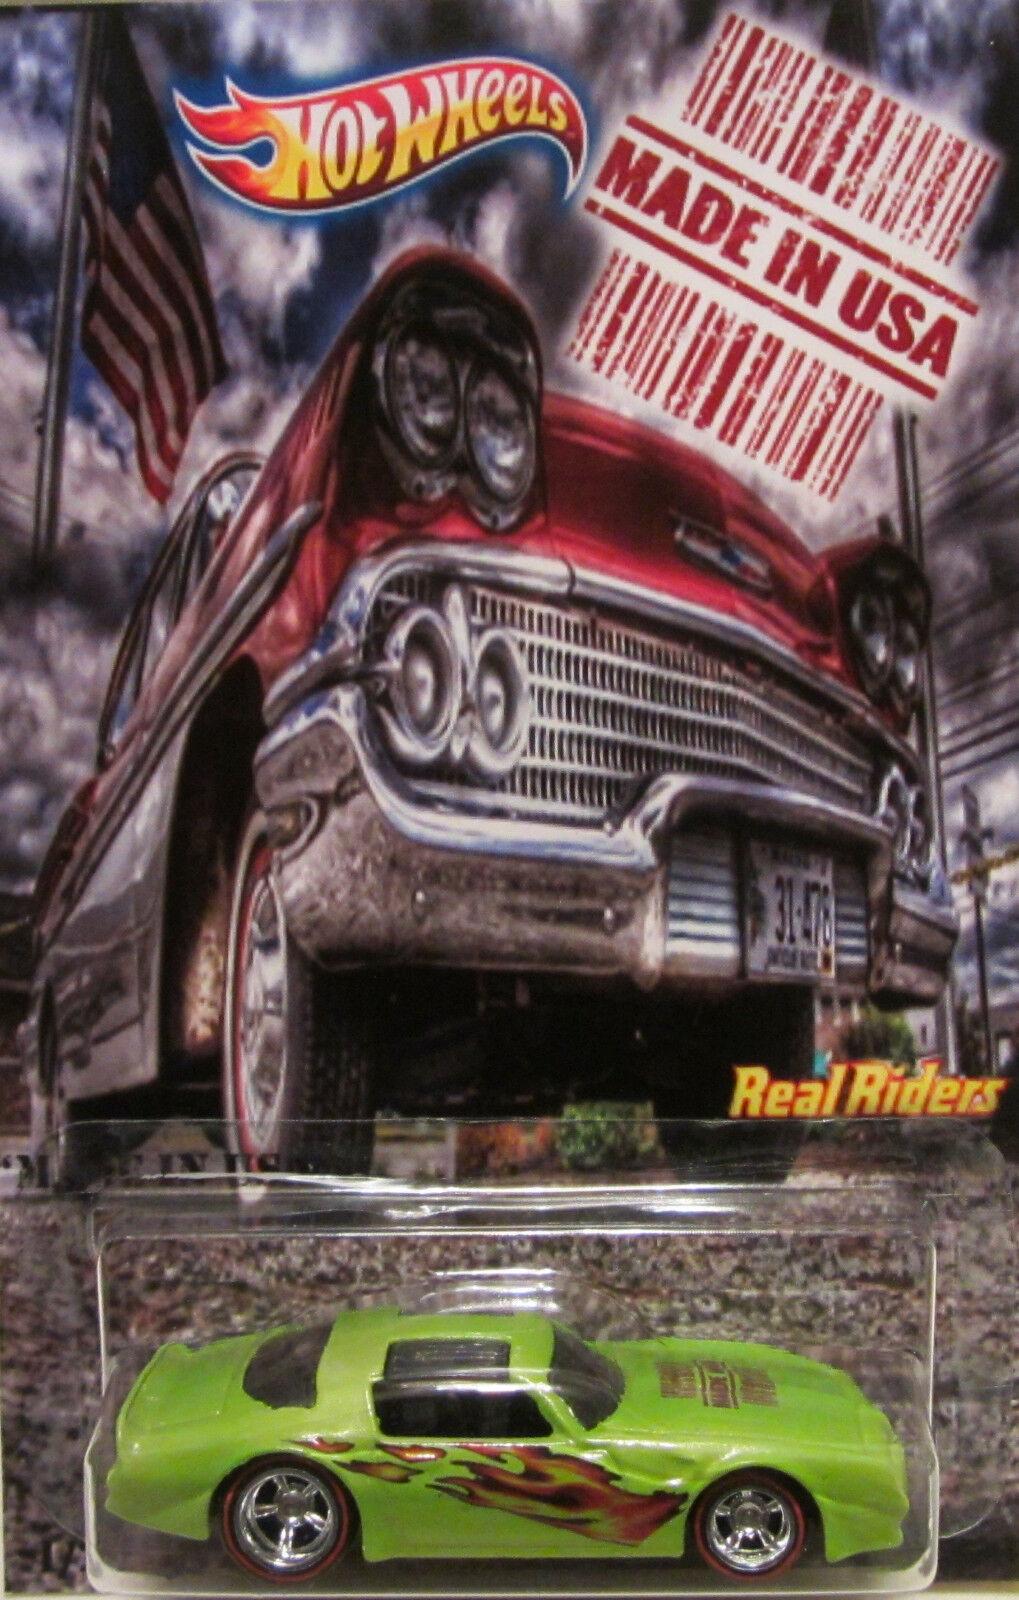 Hot Wheels CUSTOM '77 PONTIAC FIREBIRD  Made in USA  Real Riders LTD 1 25 Made